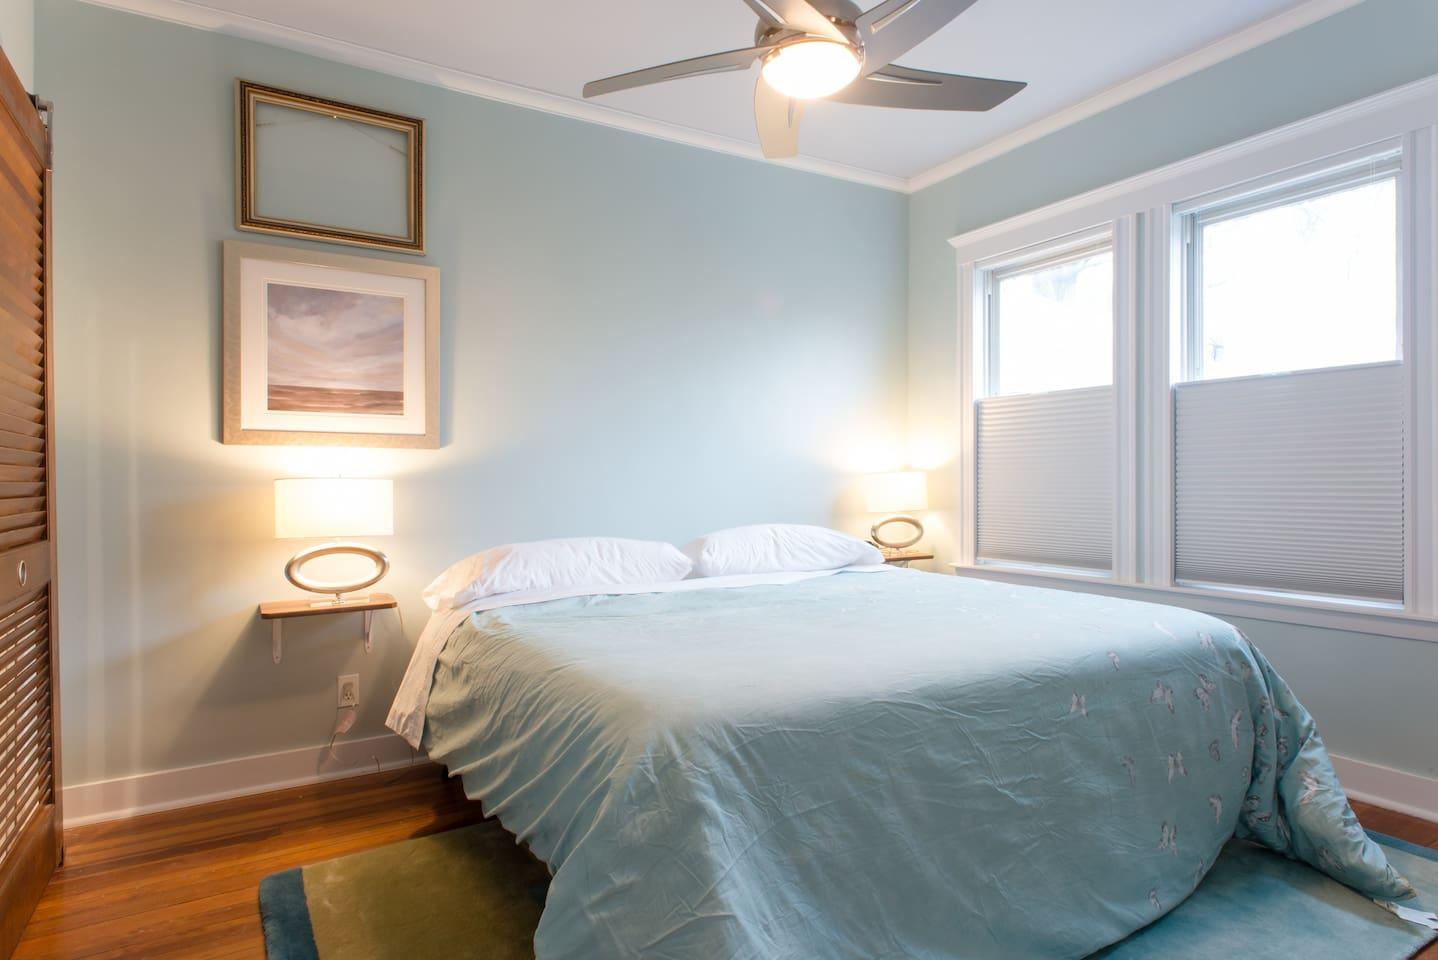 King memory foam Casper bed with cotton bedding.  Super comfy.